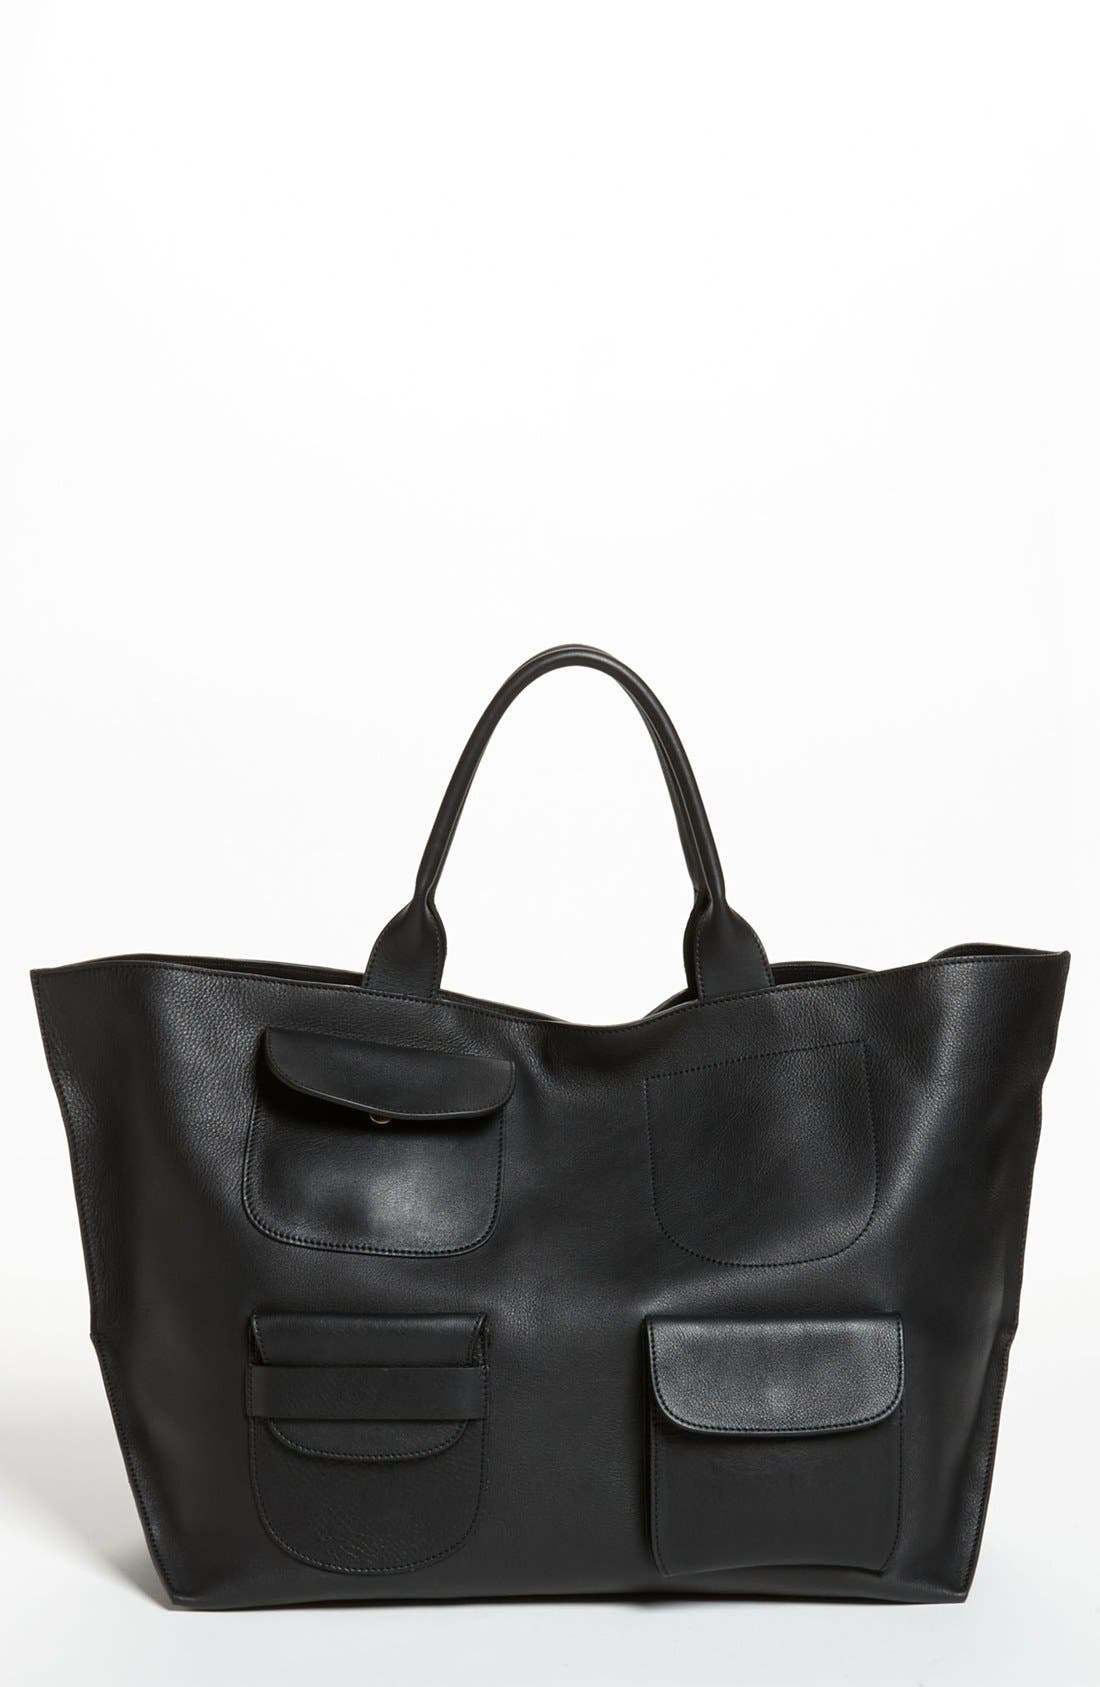 Alternate Image 1 Selected - Marni Leather Tote